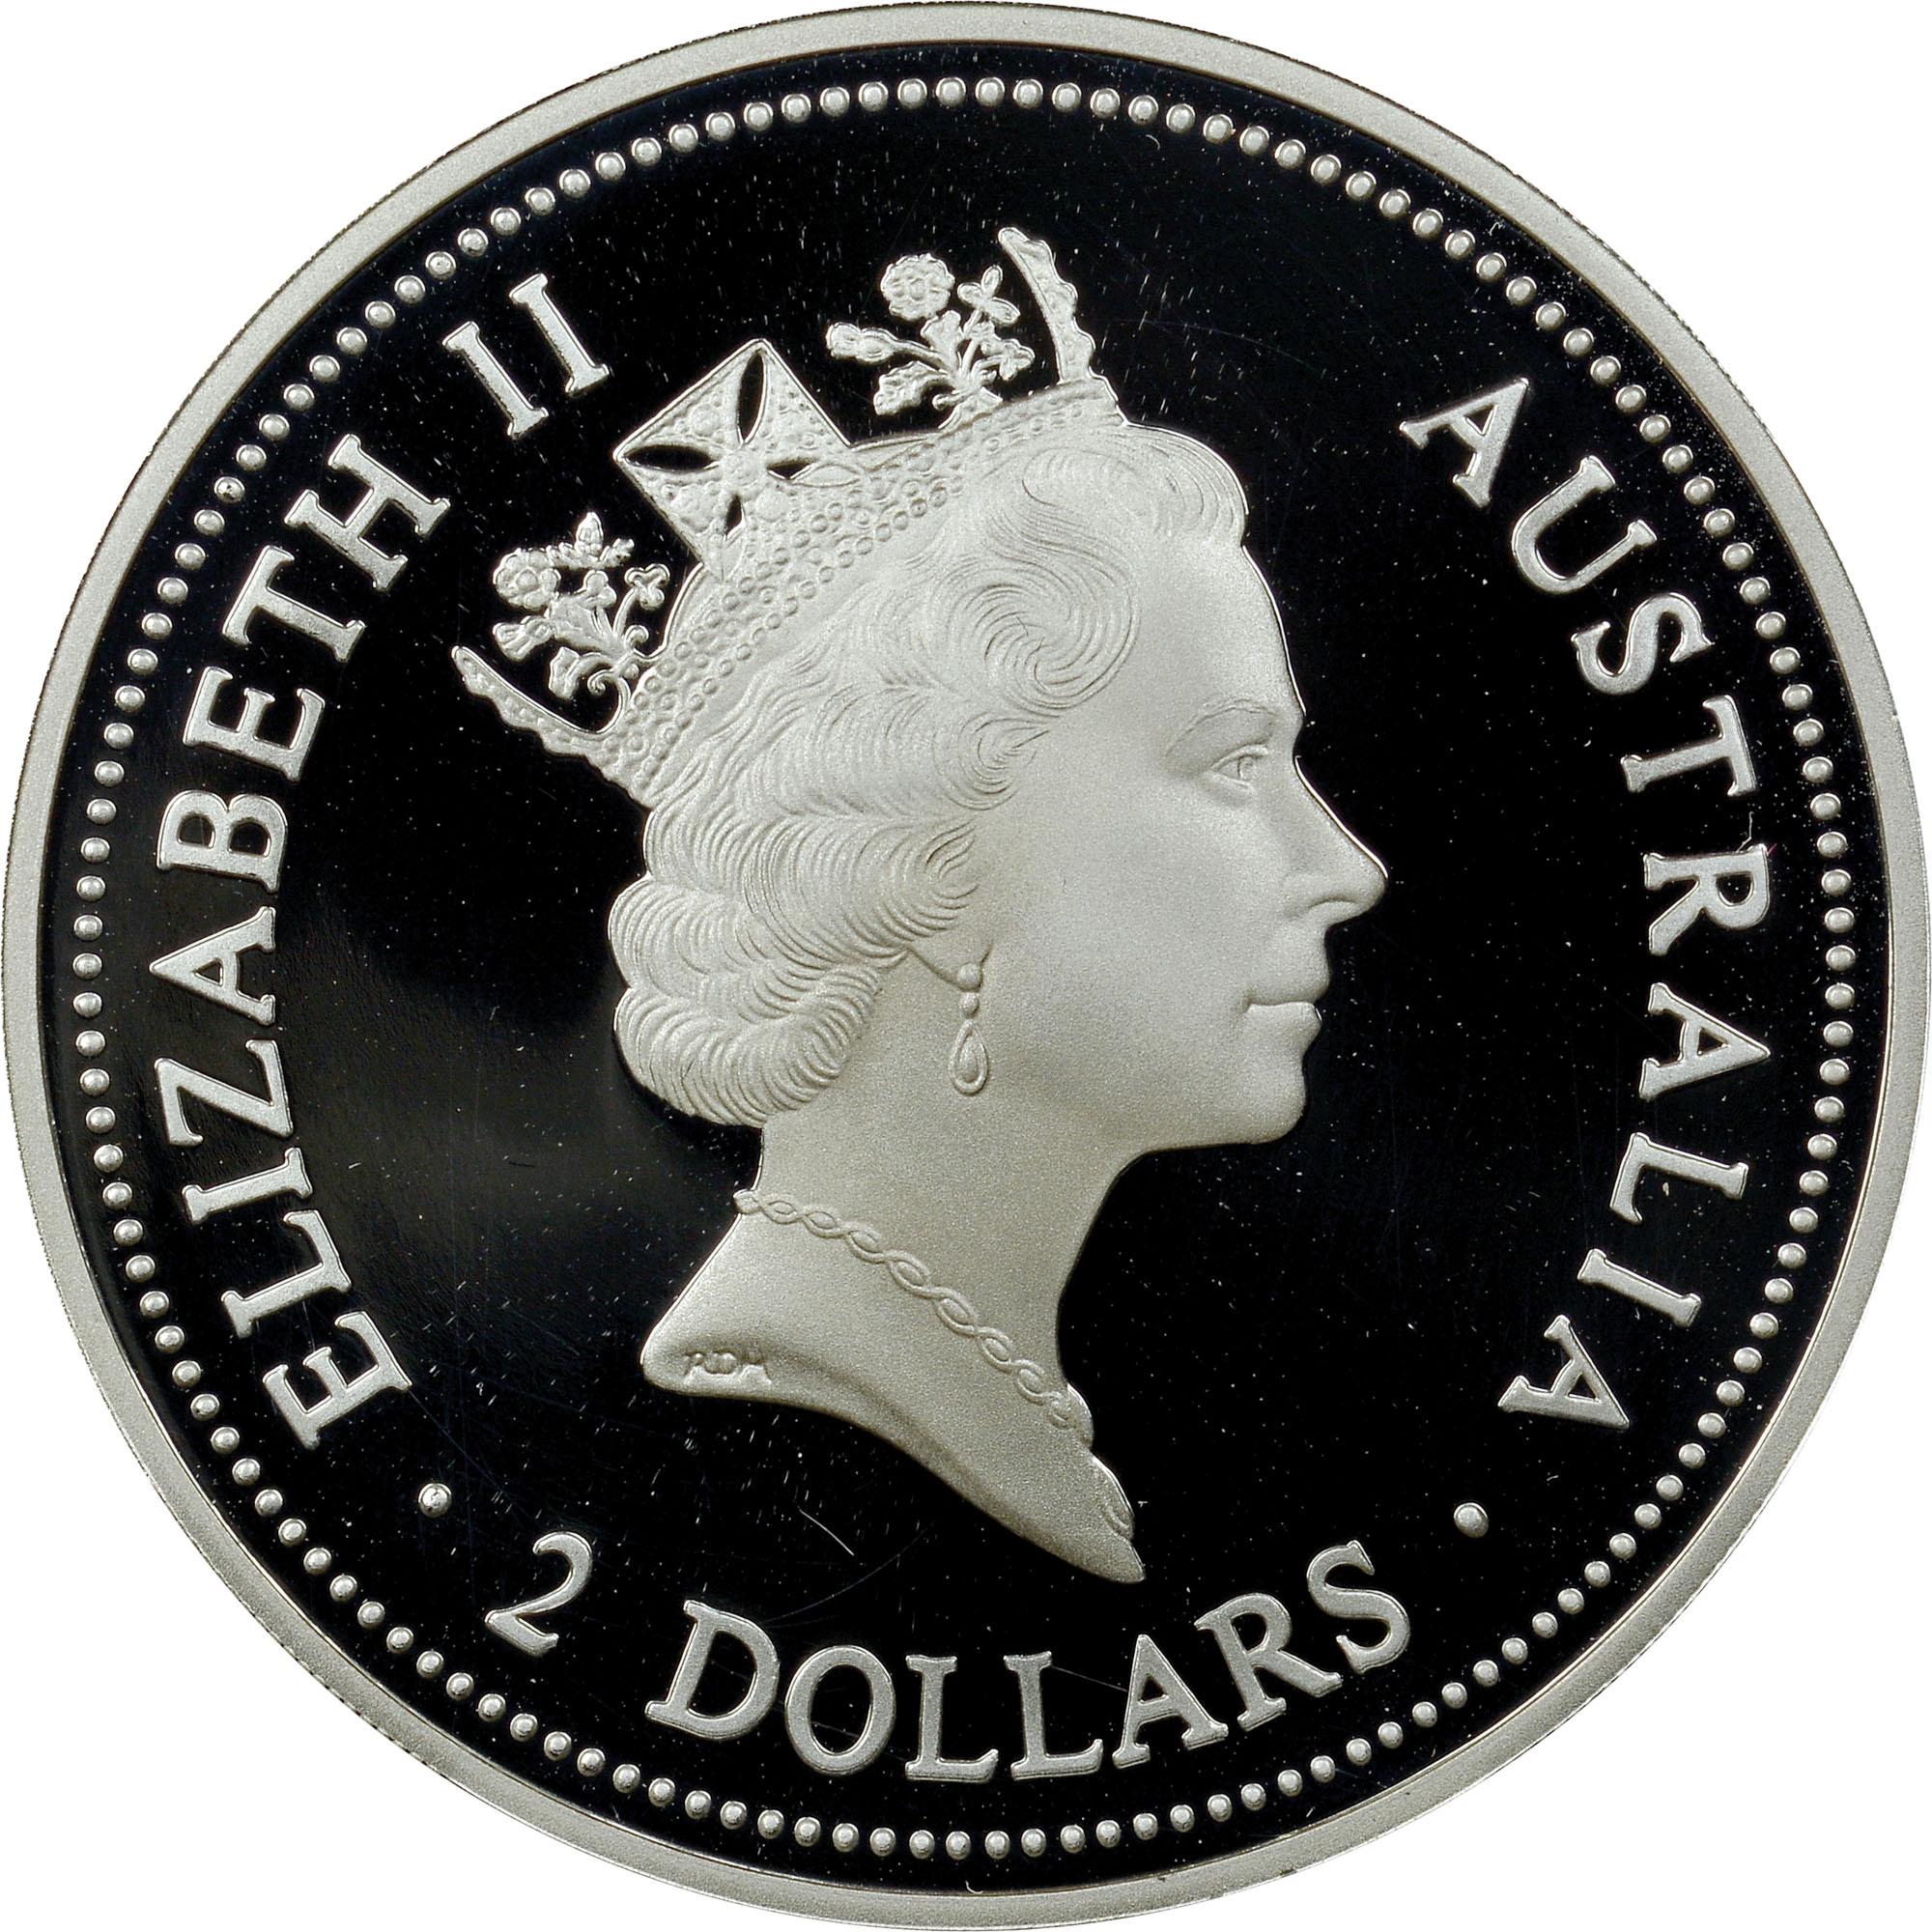 1995-1996 Australia 2 Dollars obverse